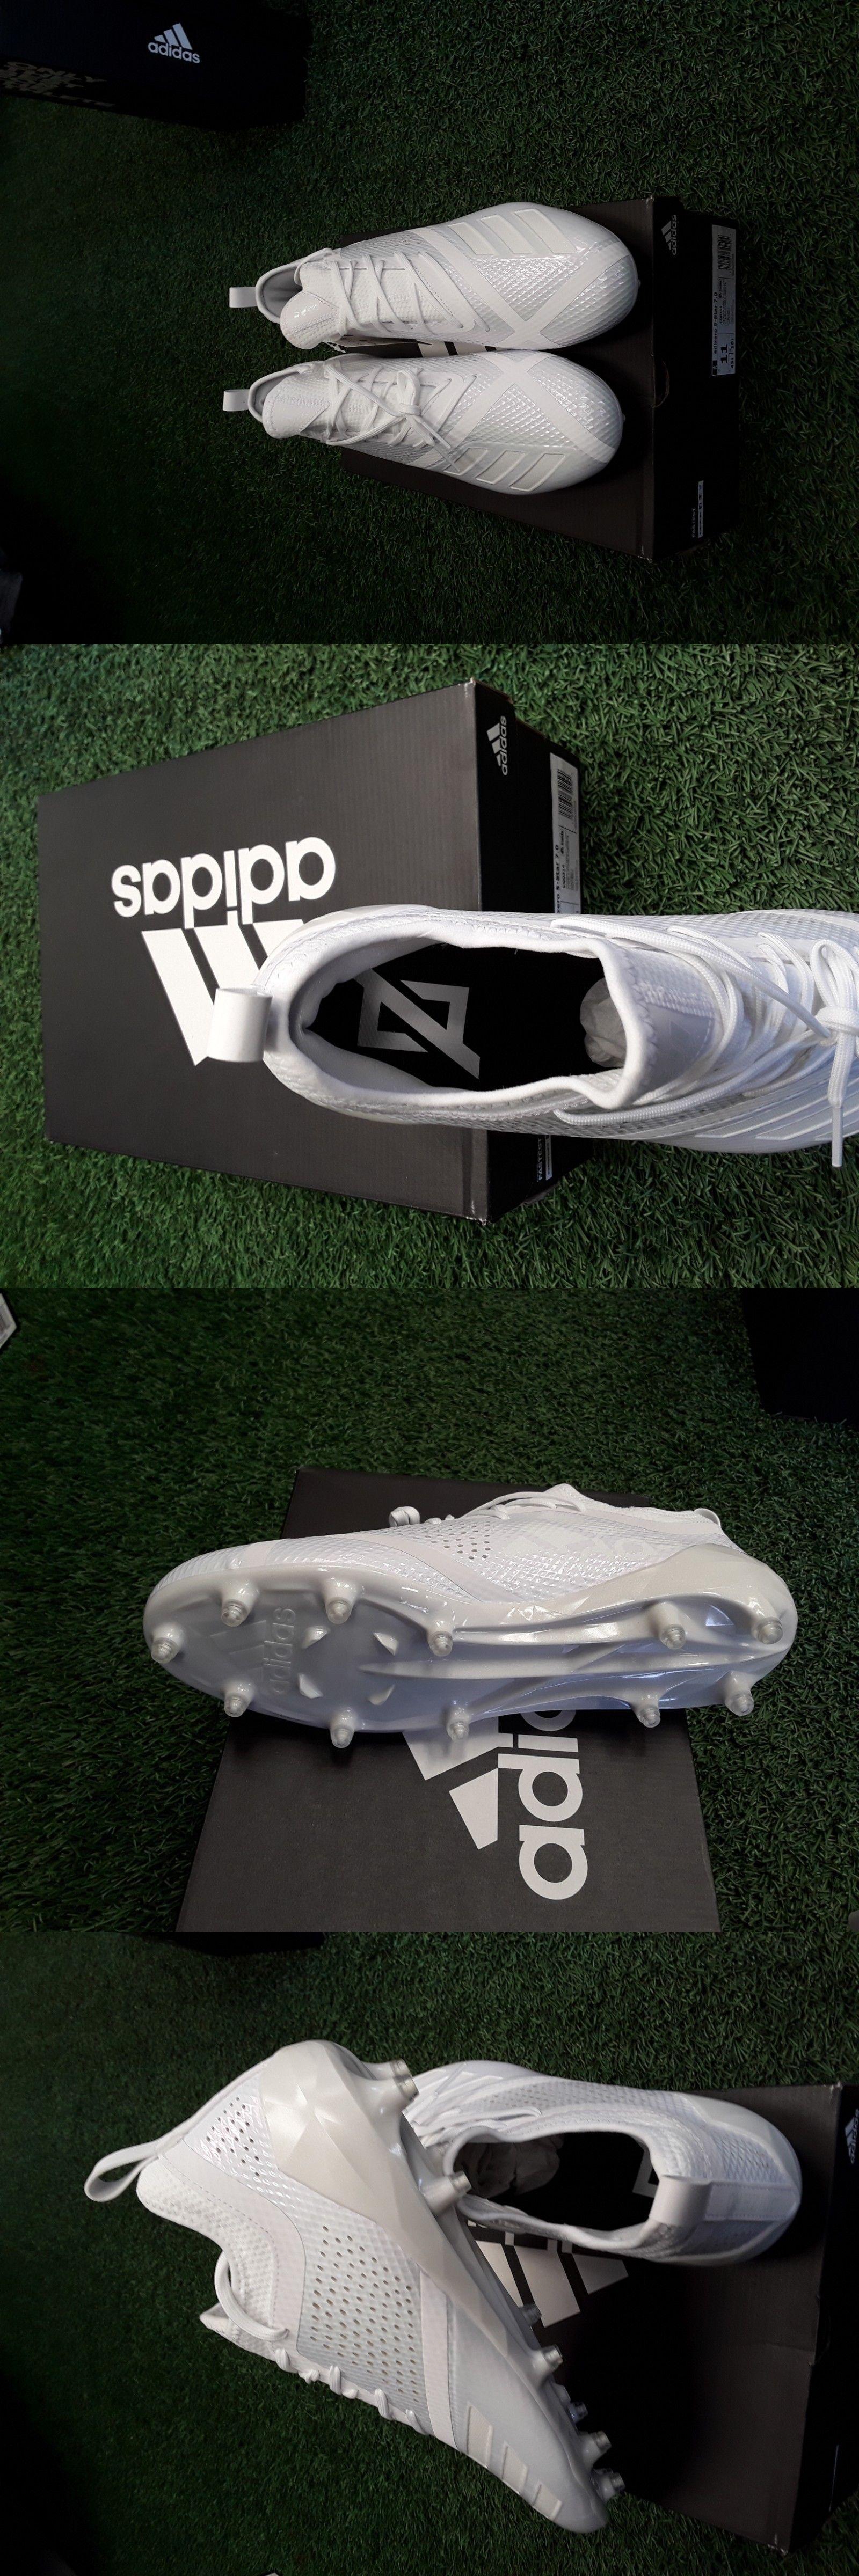 new concept 3ece9 7c56b Football 21214 Adidas Adizero 5-Star 7.0 White White Football Cleats Cq0316  -